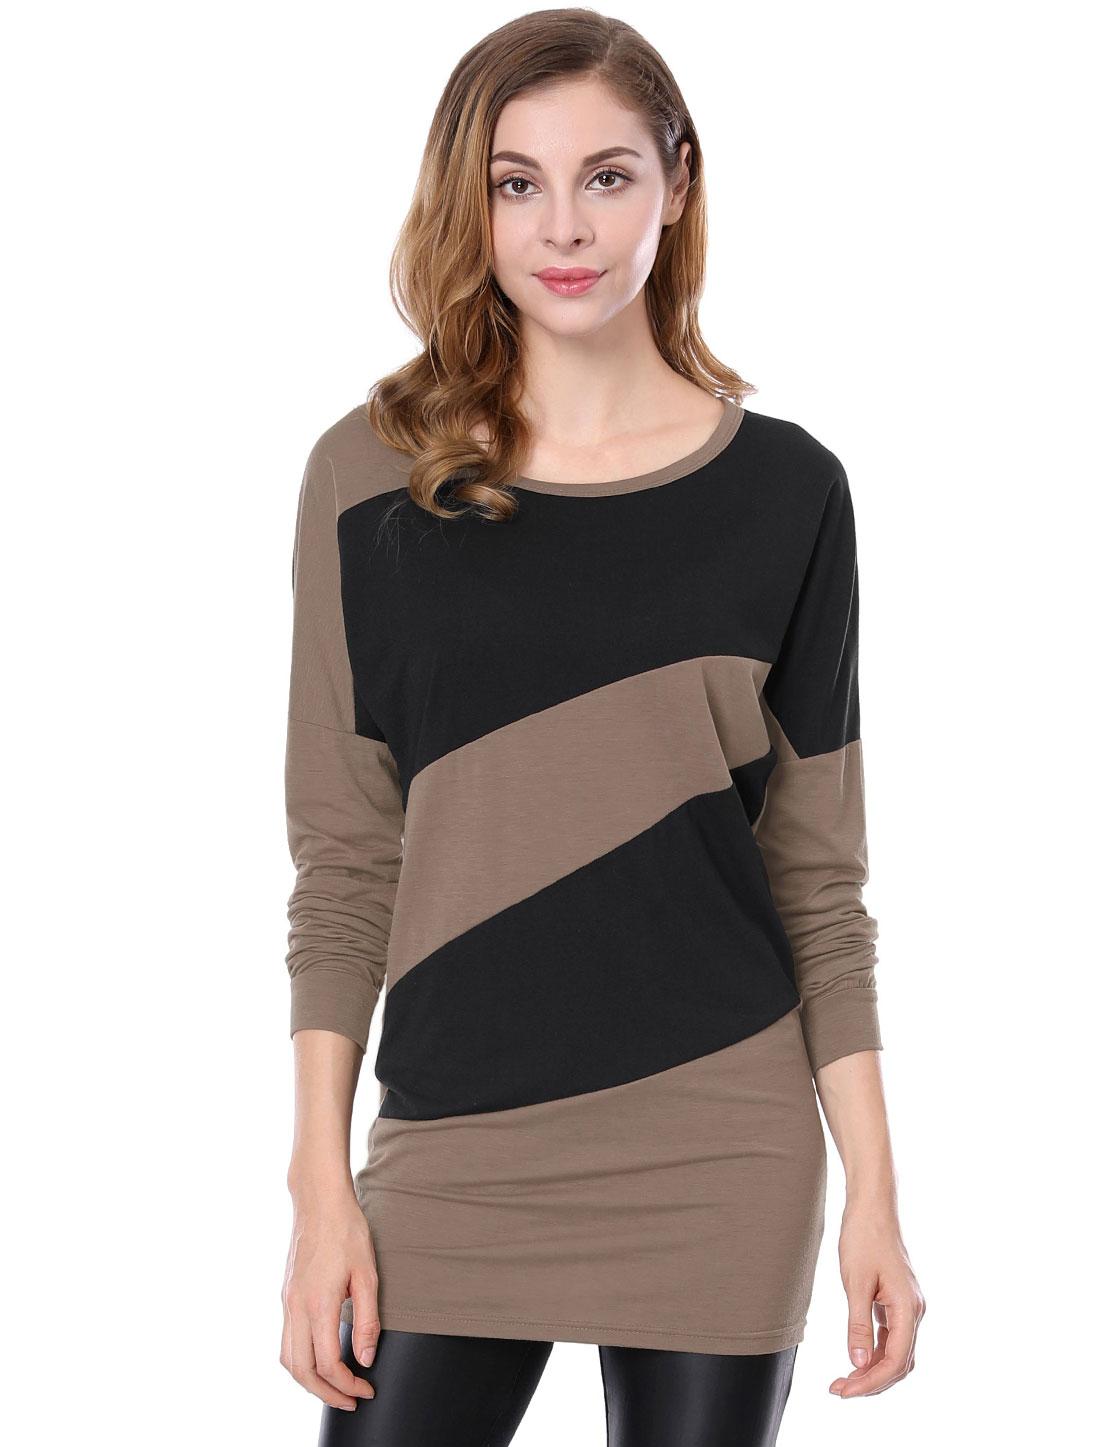 Woman Stylish Light Coffee Black Striped Design Loose Tunic Tops M